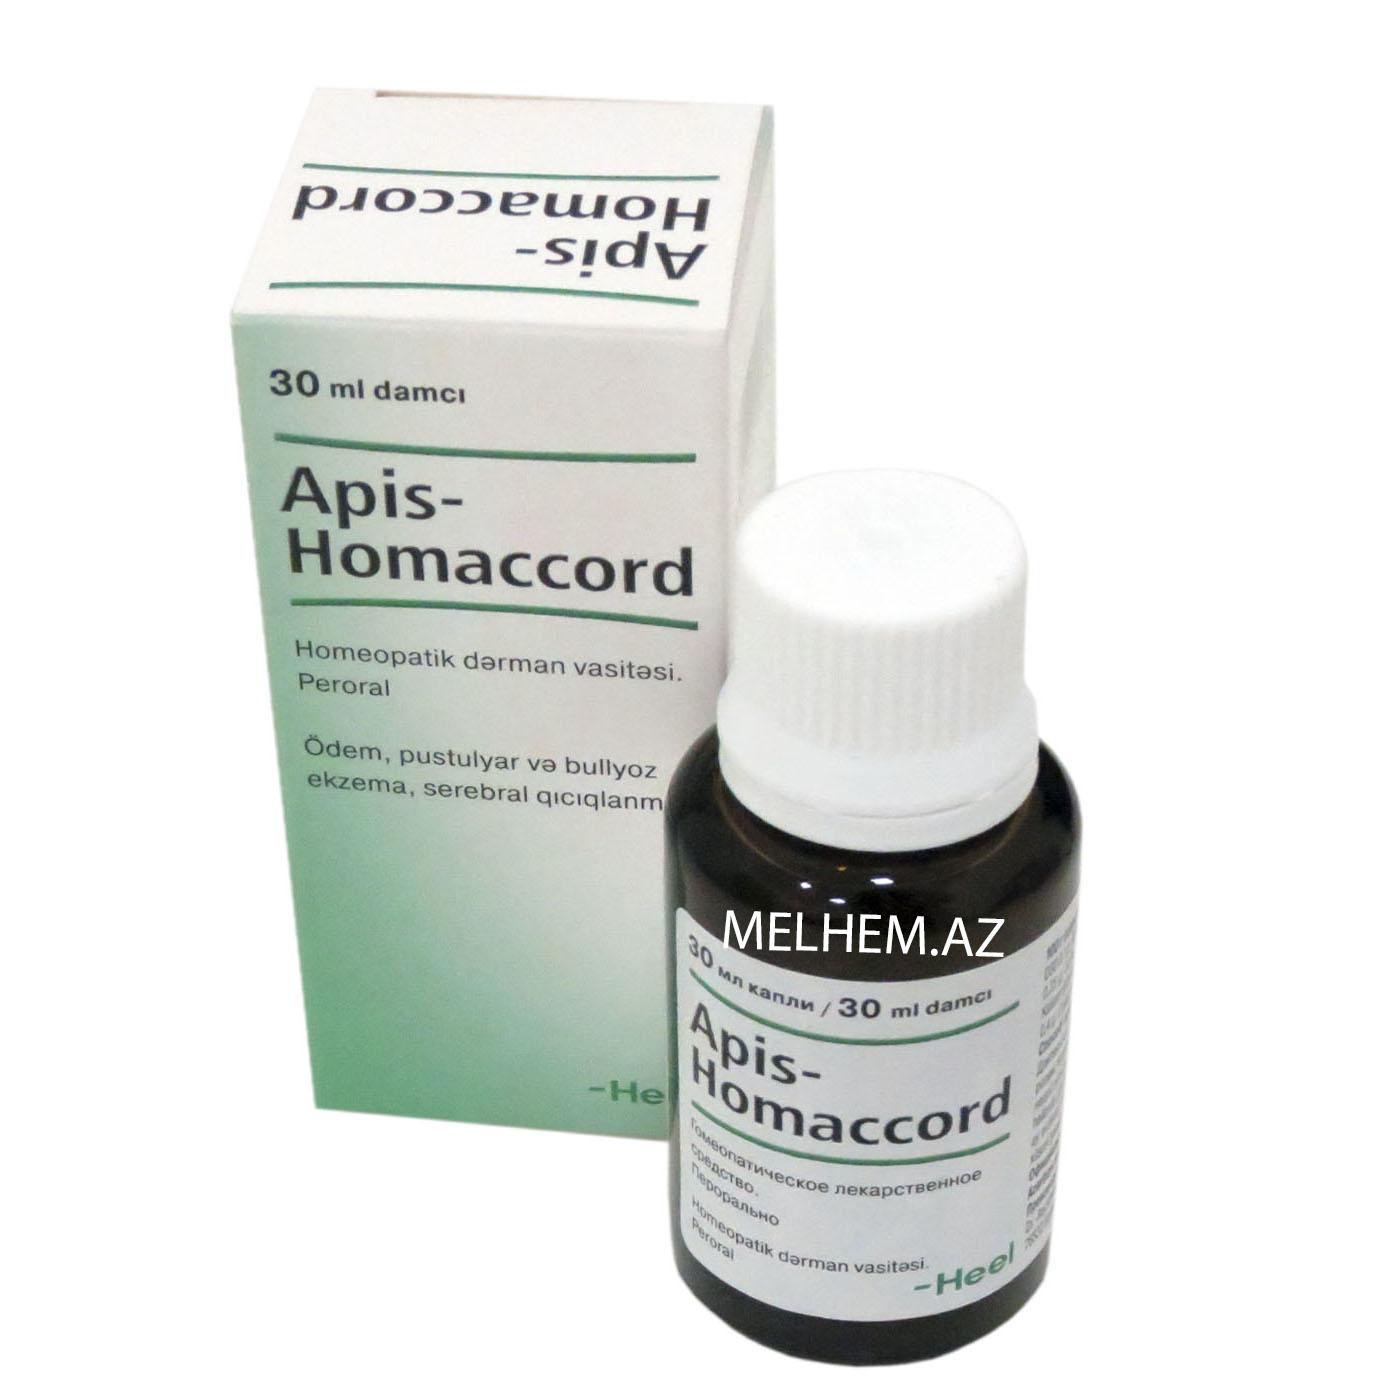 APİS-HOMACCORD 30 ML DAMCI